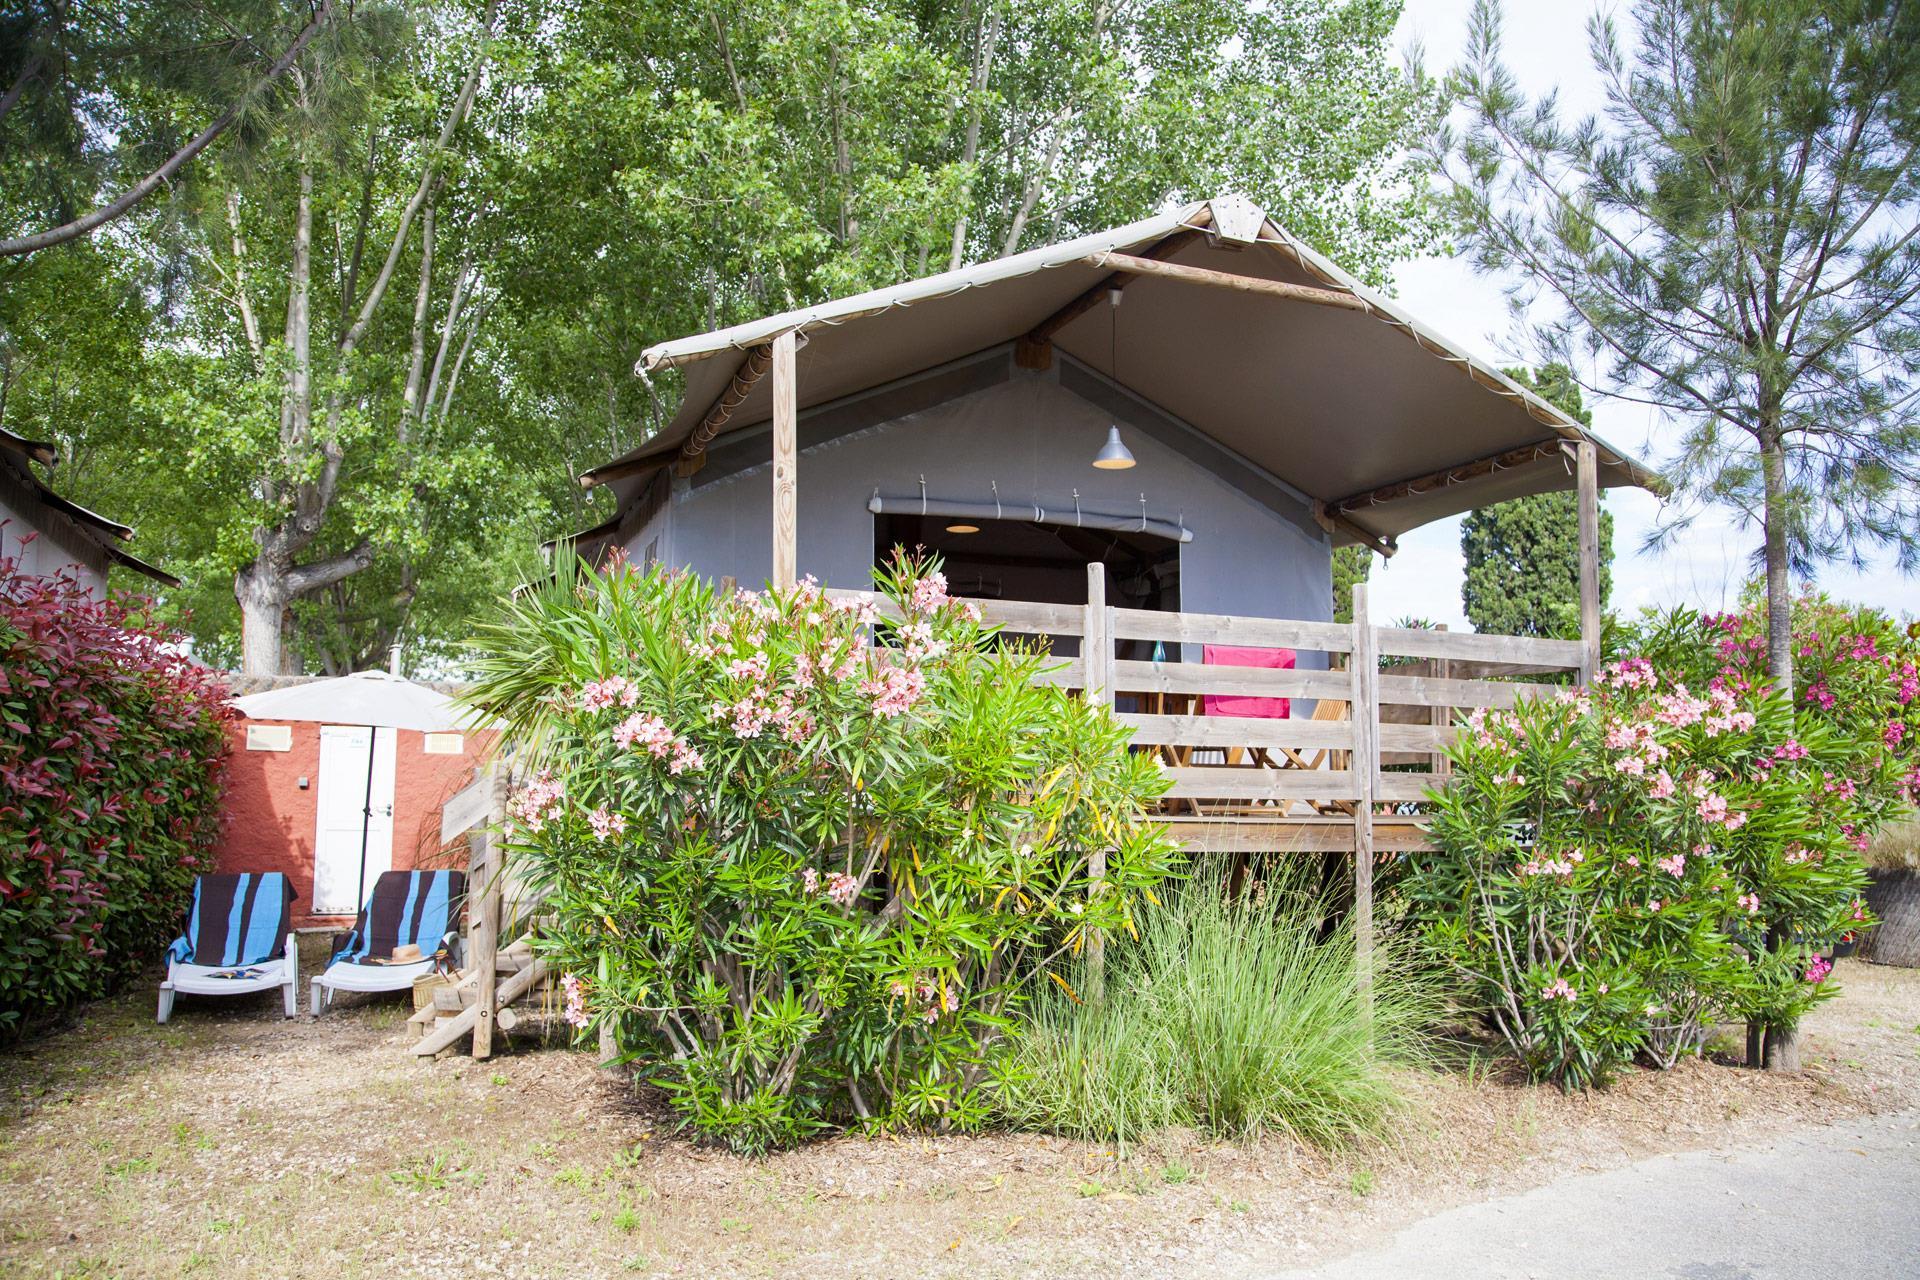 Location - Lodge Pilotis 2 Chambres** - Camping Sandaya Riviera d'Azur